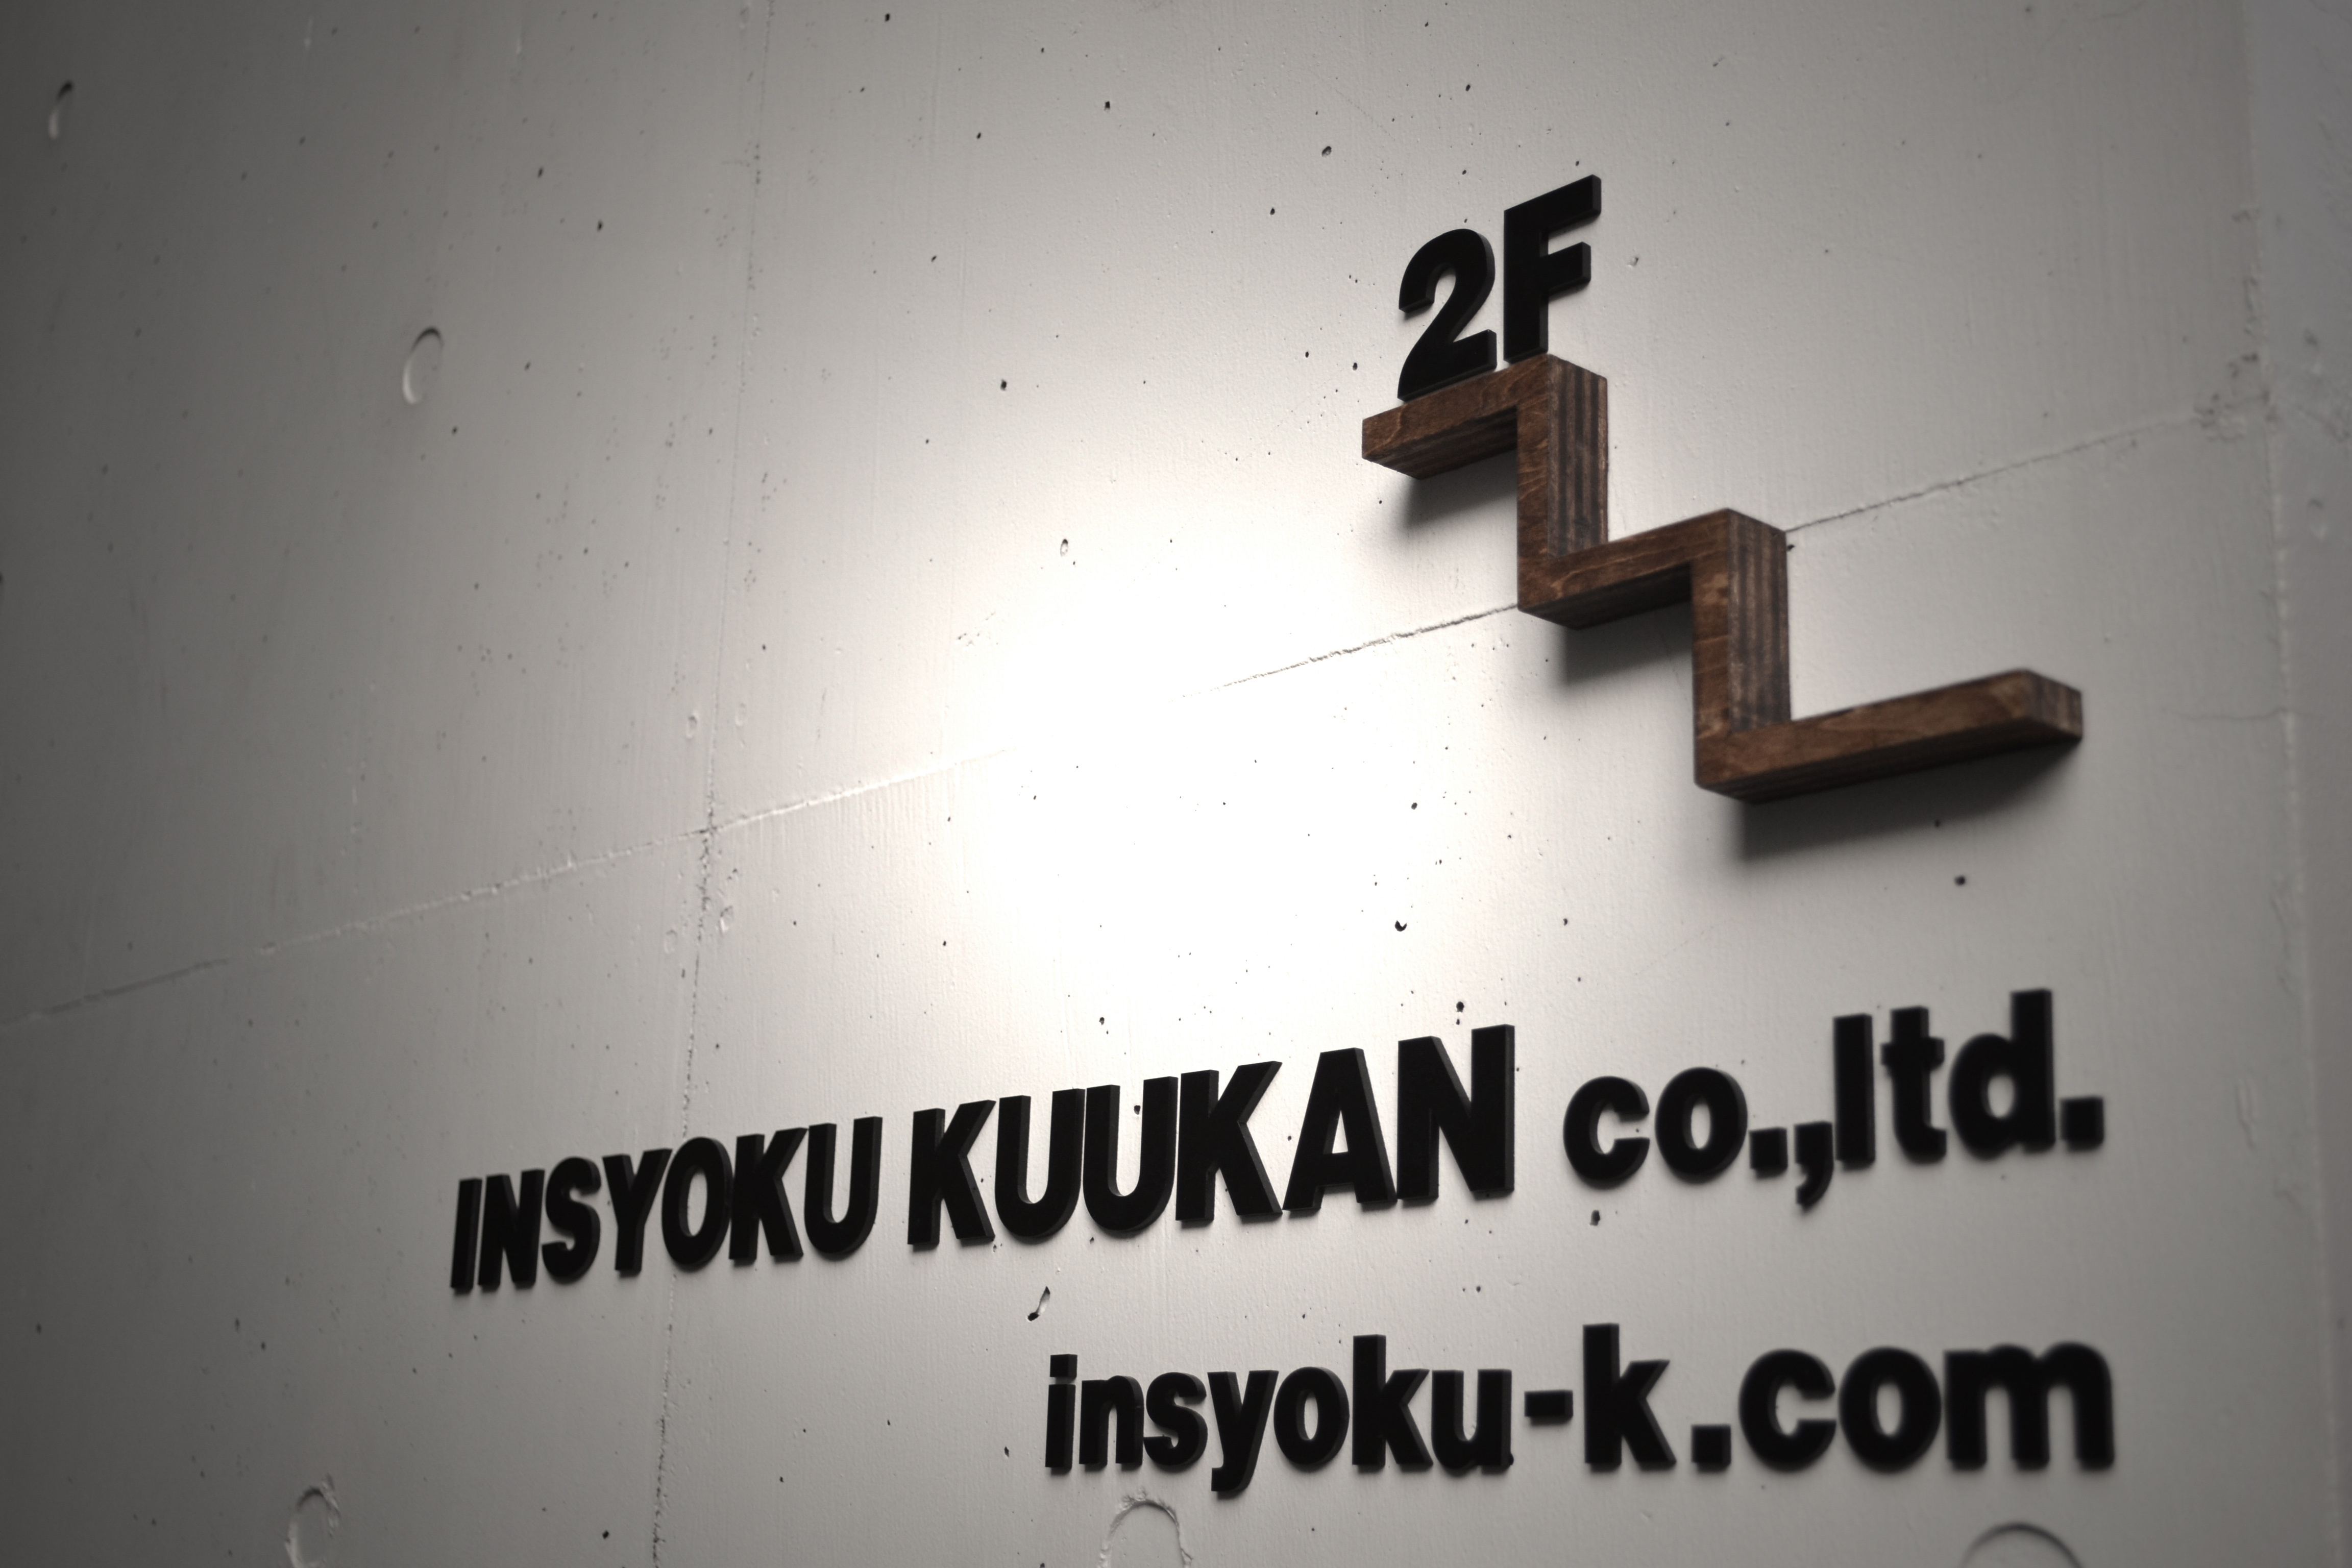 http://insyoku-k.com/wp-content/uploads/PH1.jpg